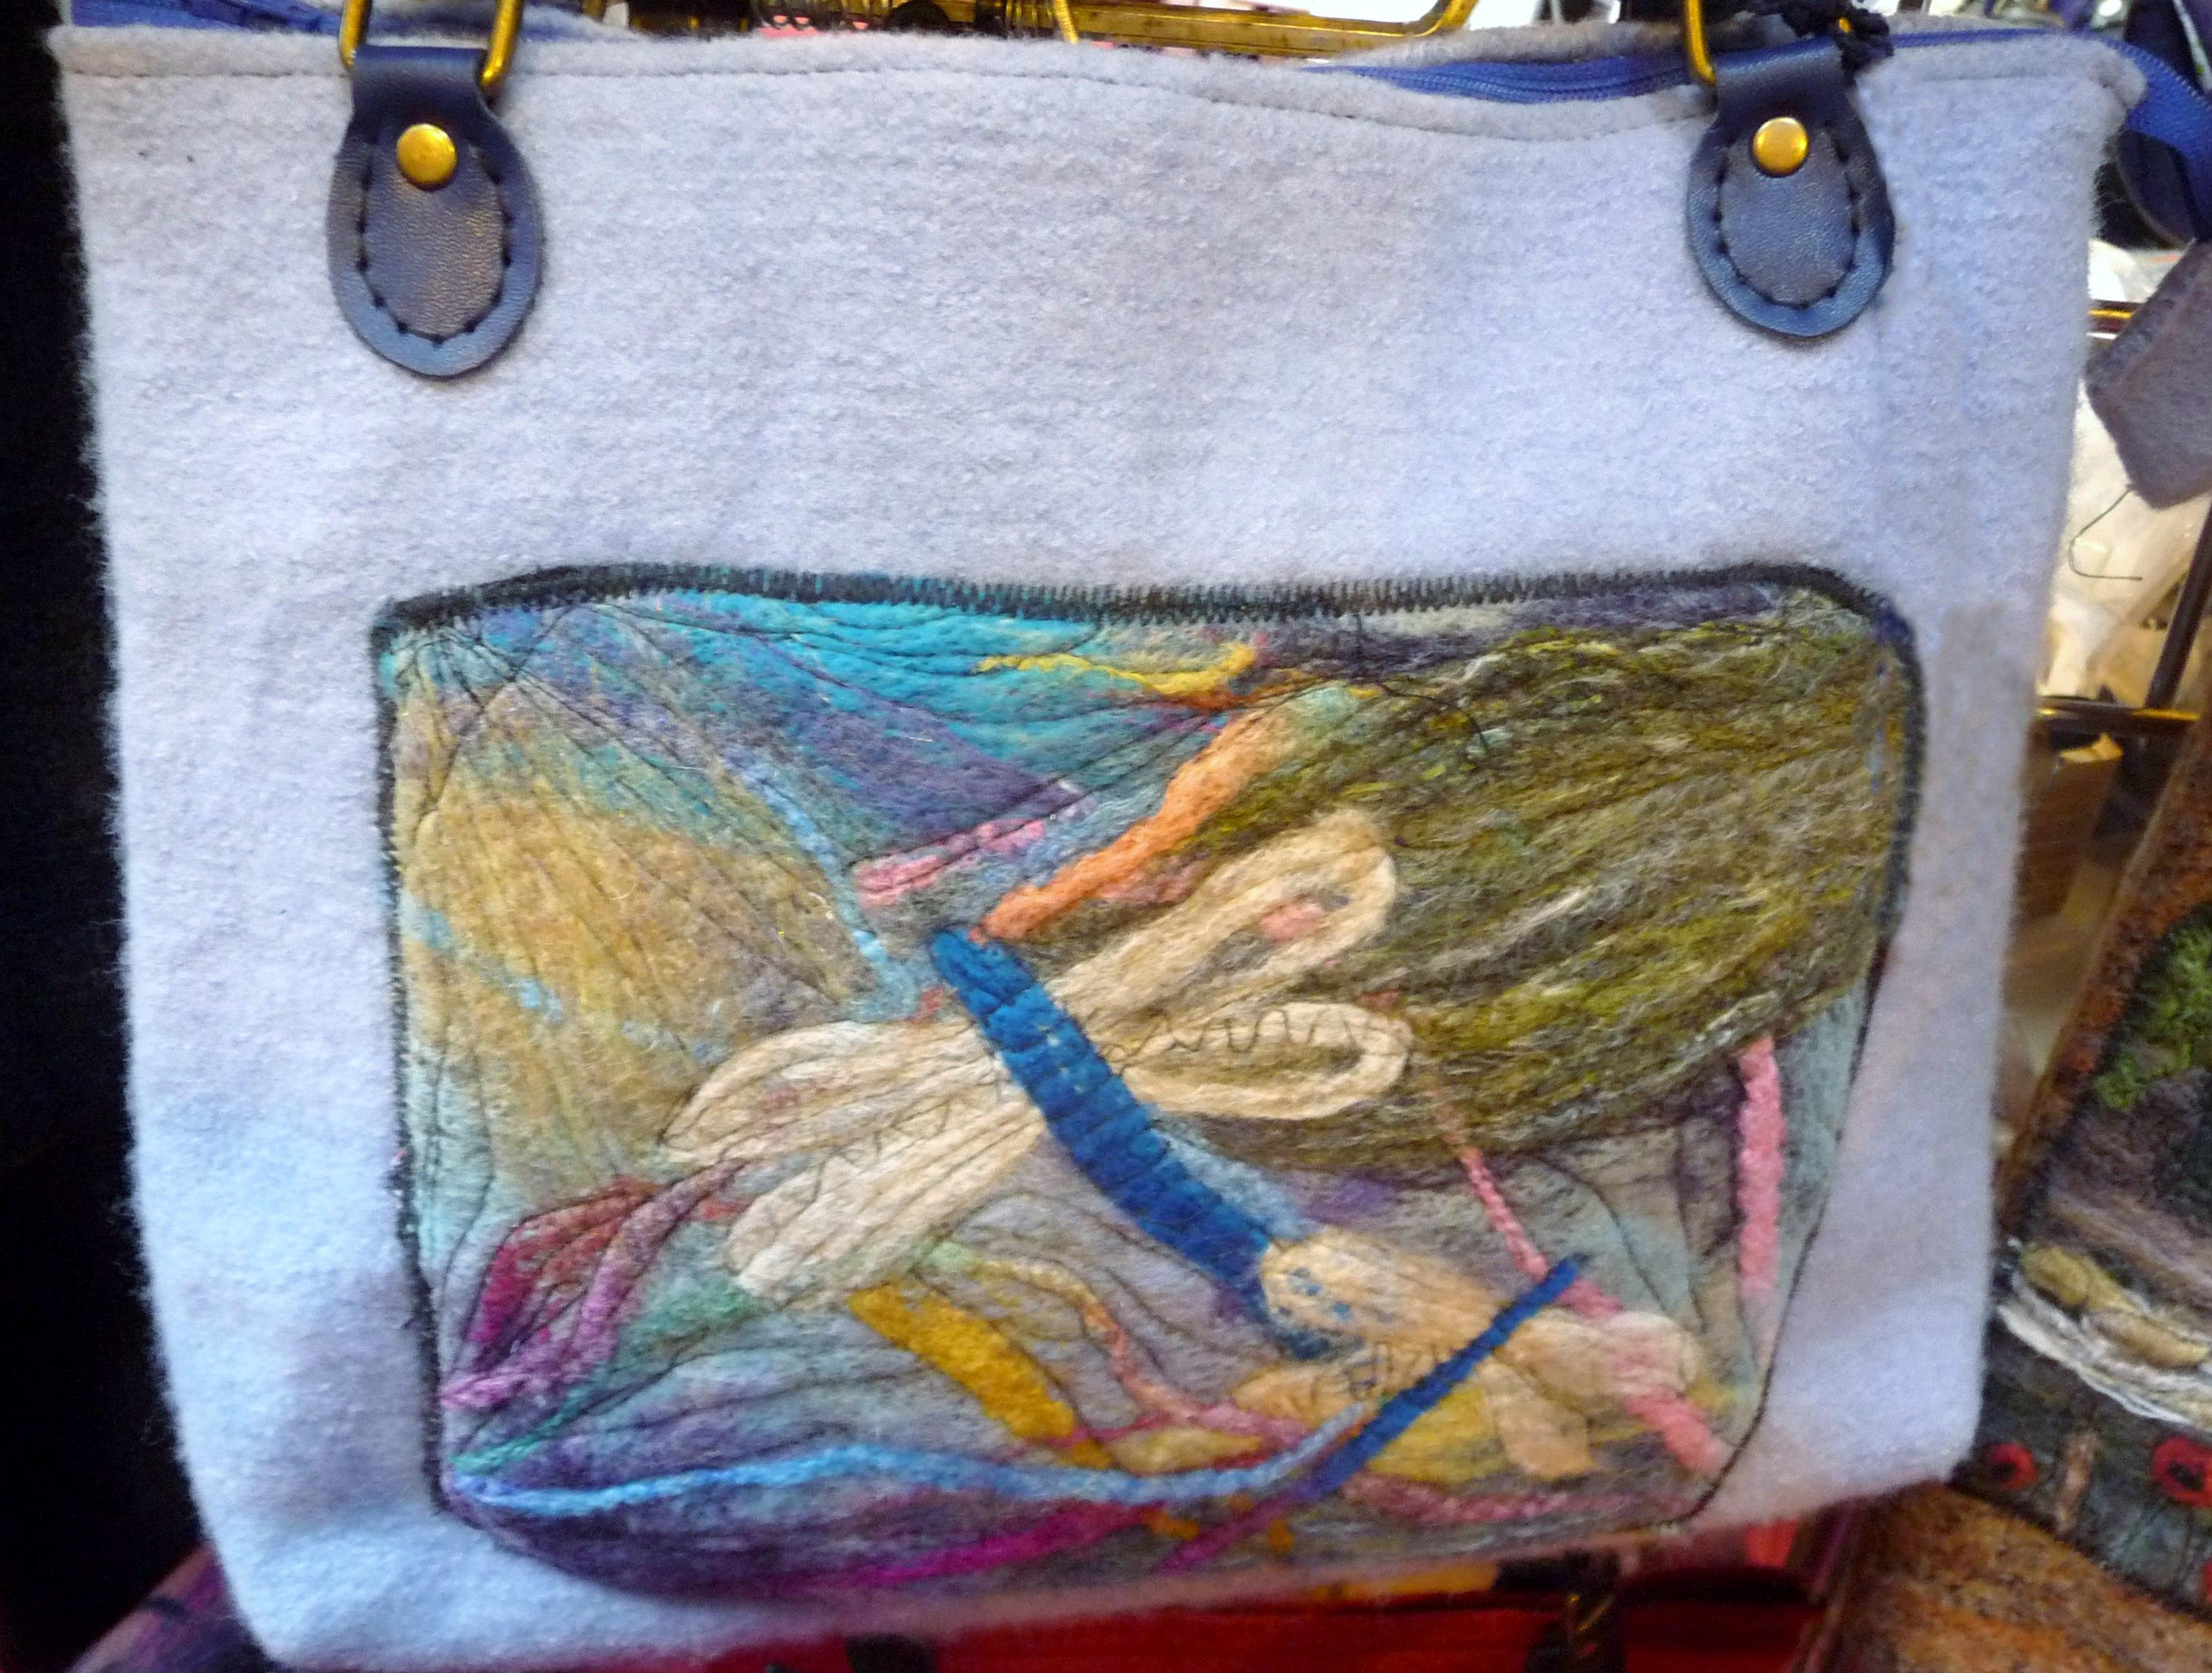 felt bag with needle felted panel